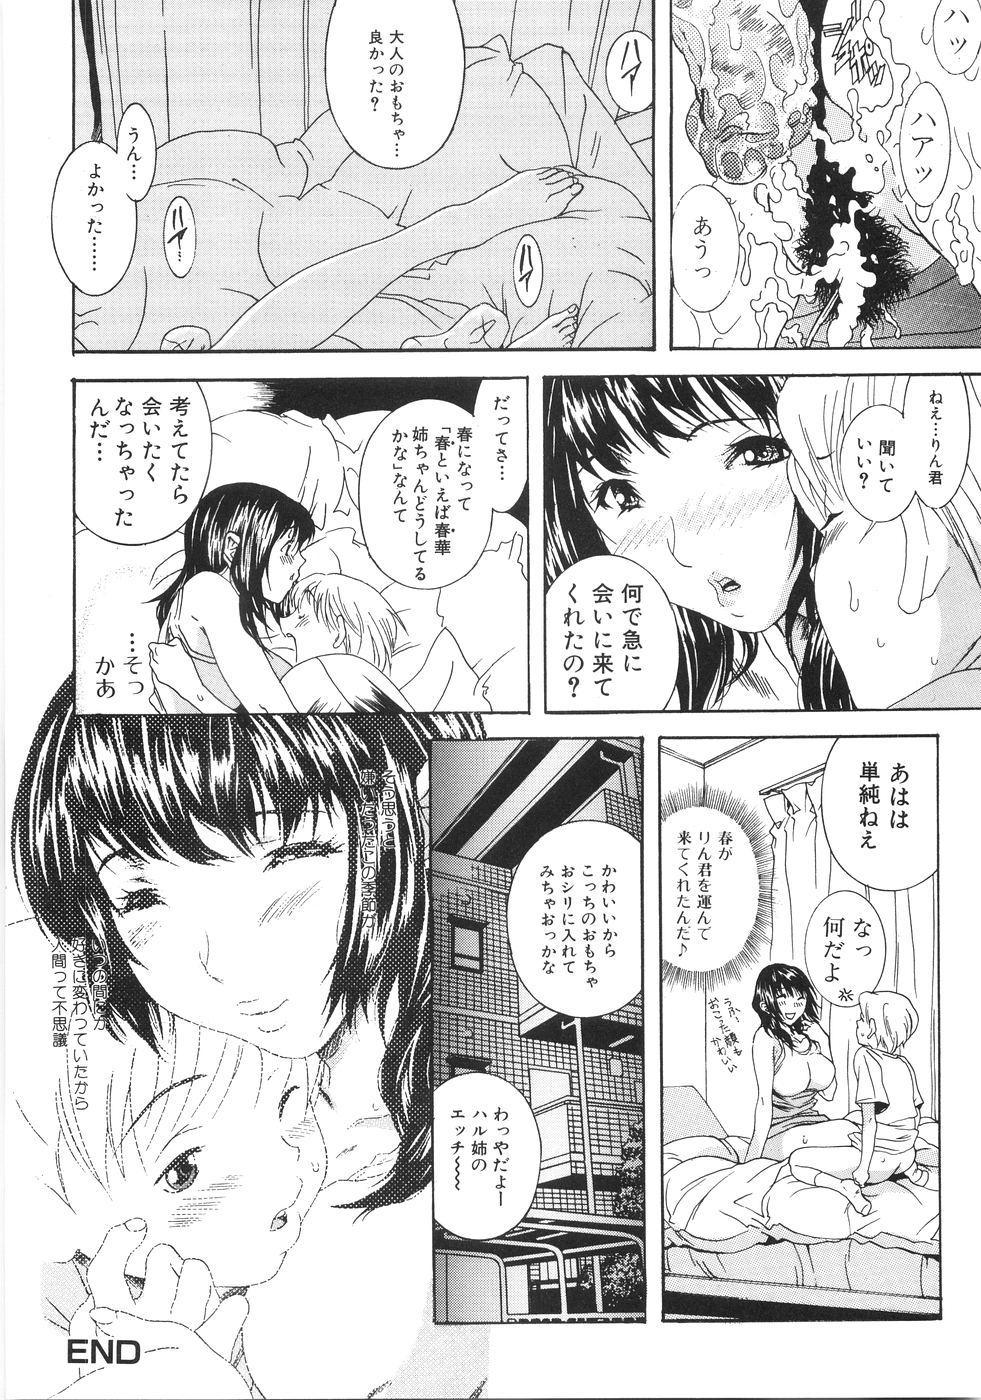 Honki Jiru - Cowper's Gland Liquid? or Love Juice?...?! 102